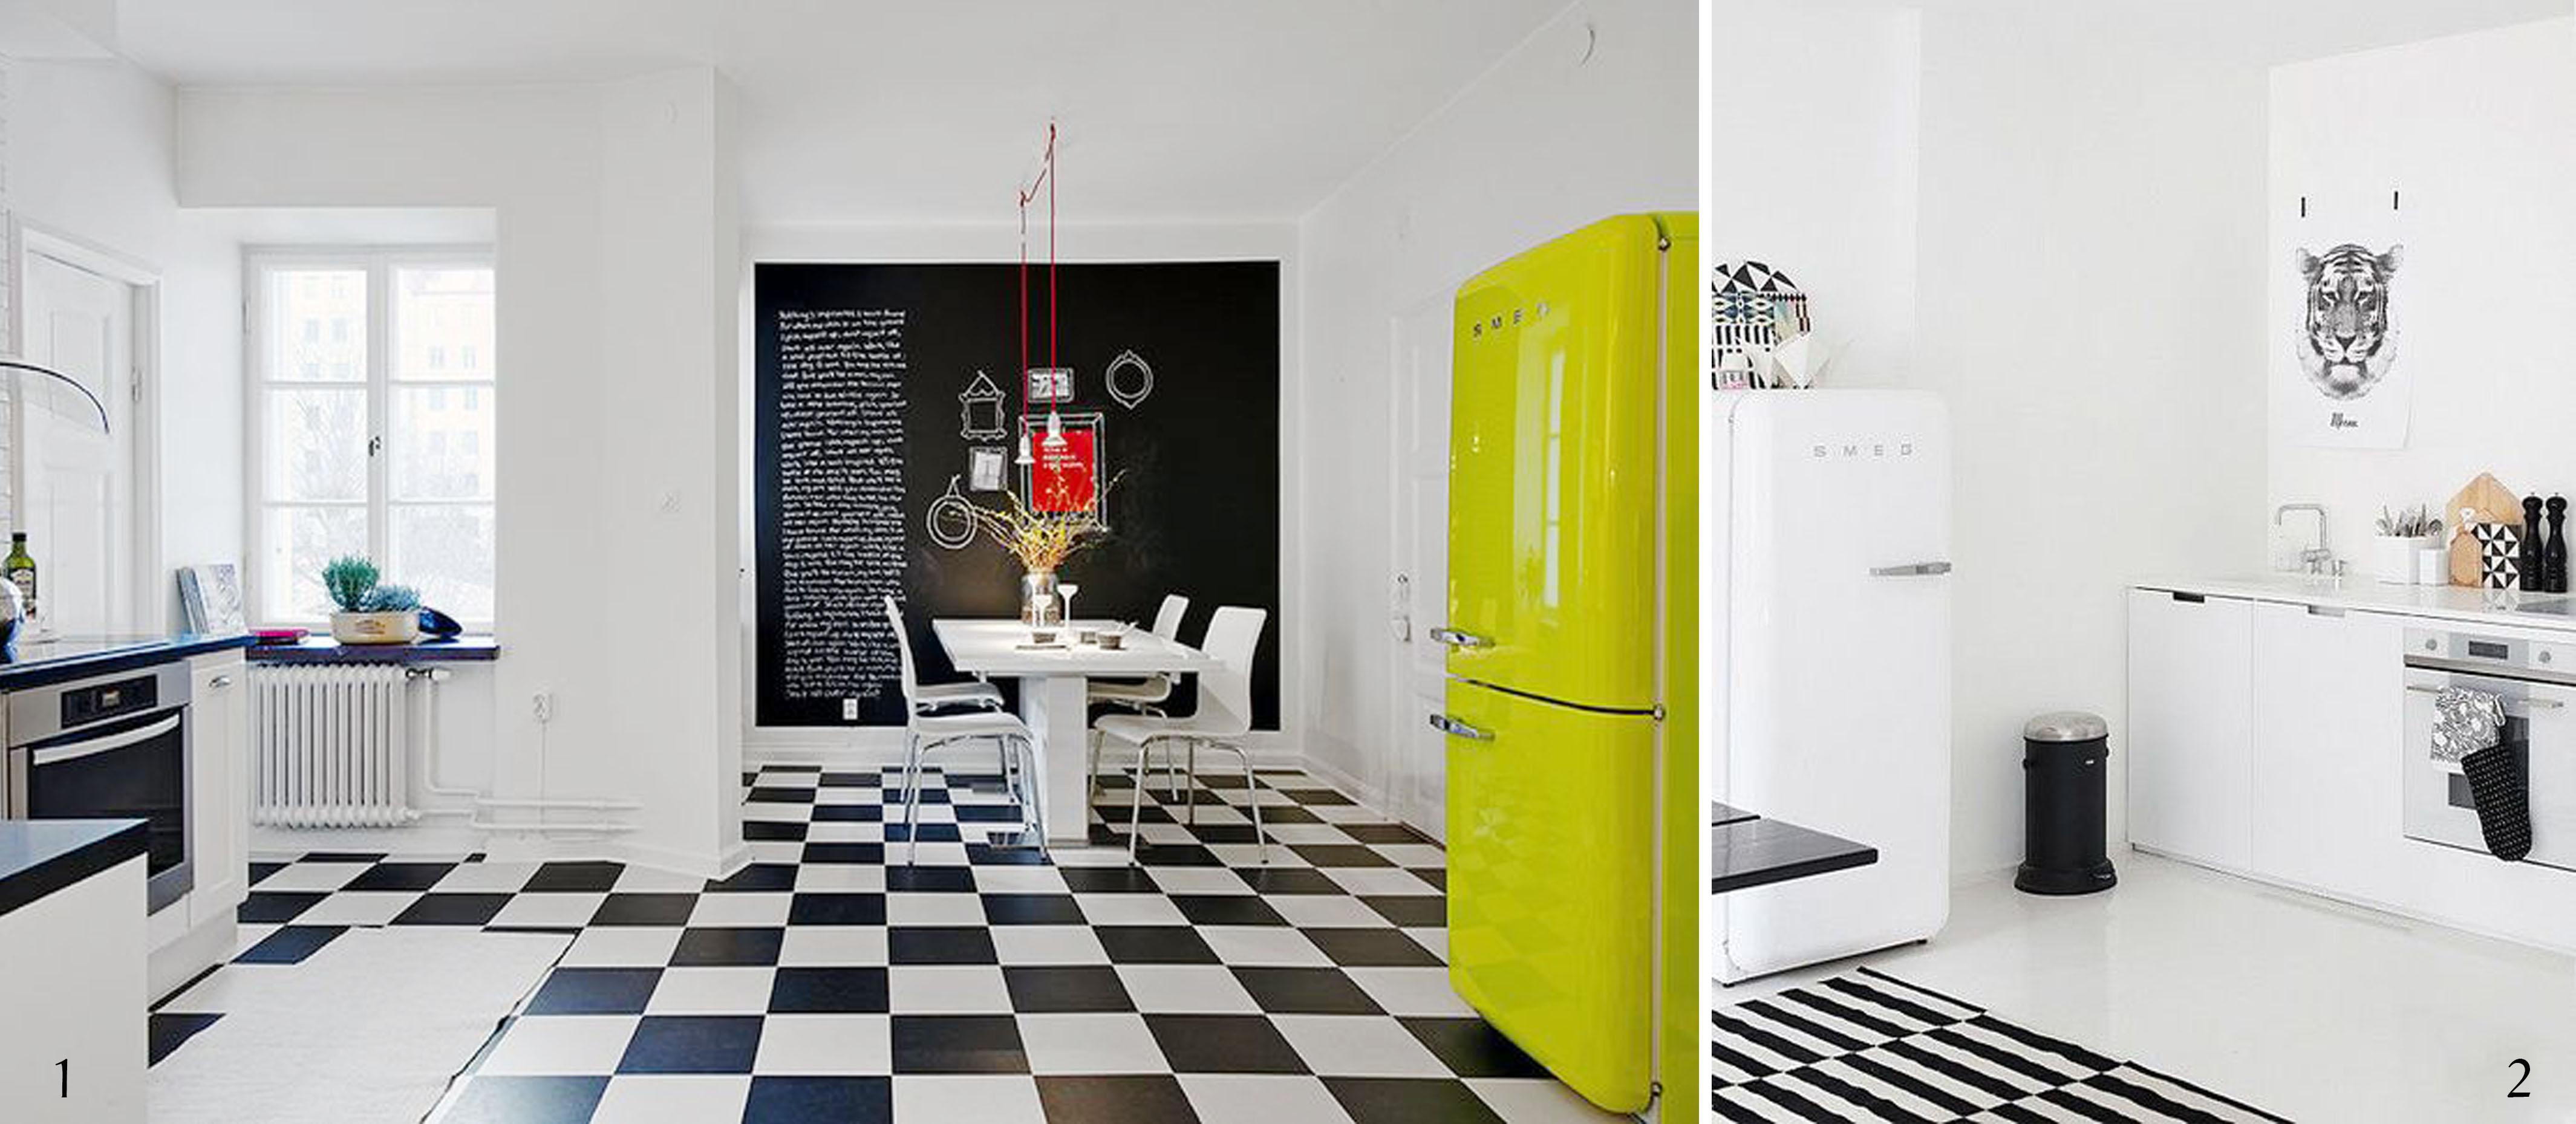 Interior Design Inspiration Happychubbystar Design